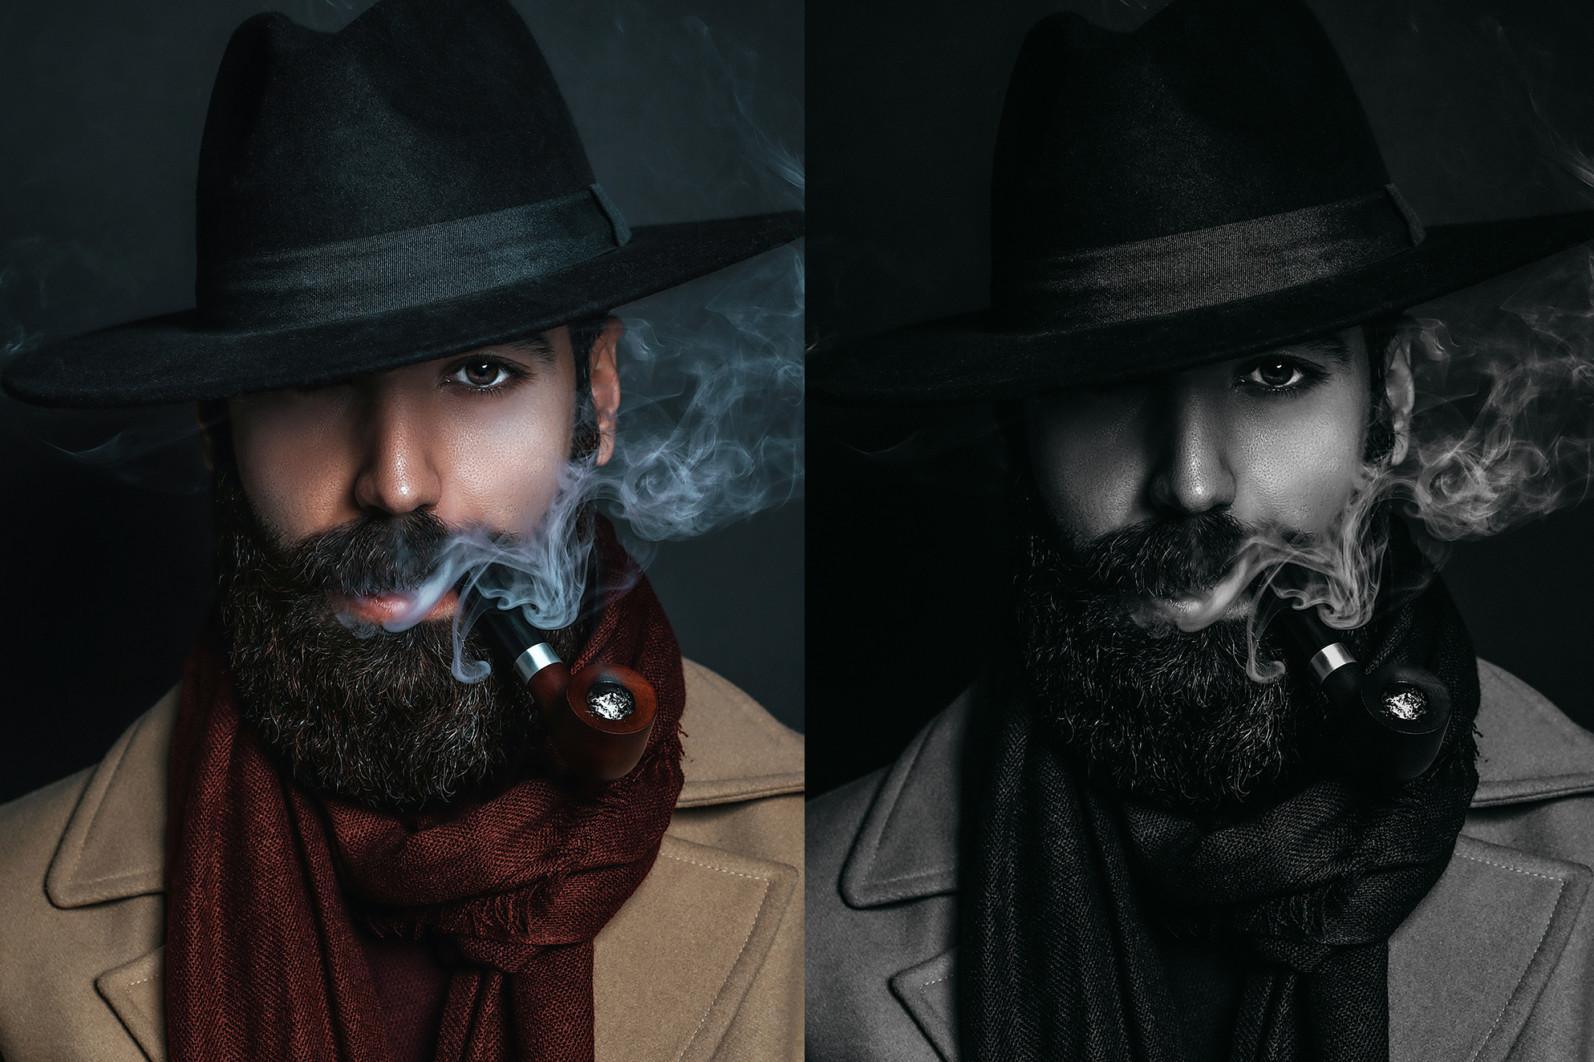 15 x Lightroom Presets, Monochrome Men Presets, Black and White Presets, Portrait Presets - 10 Monochrome Men 10 -